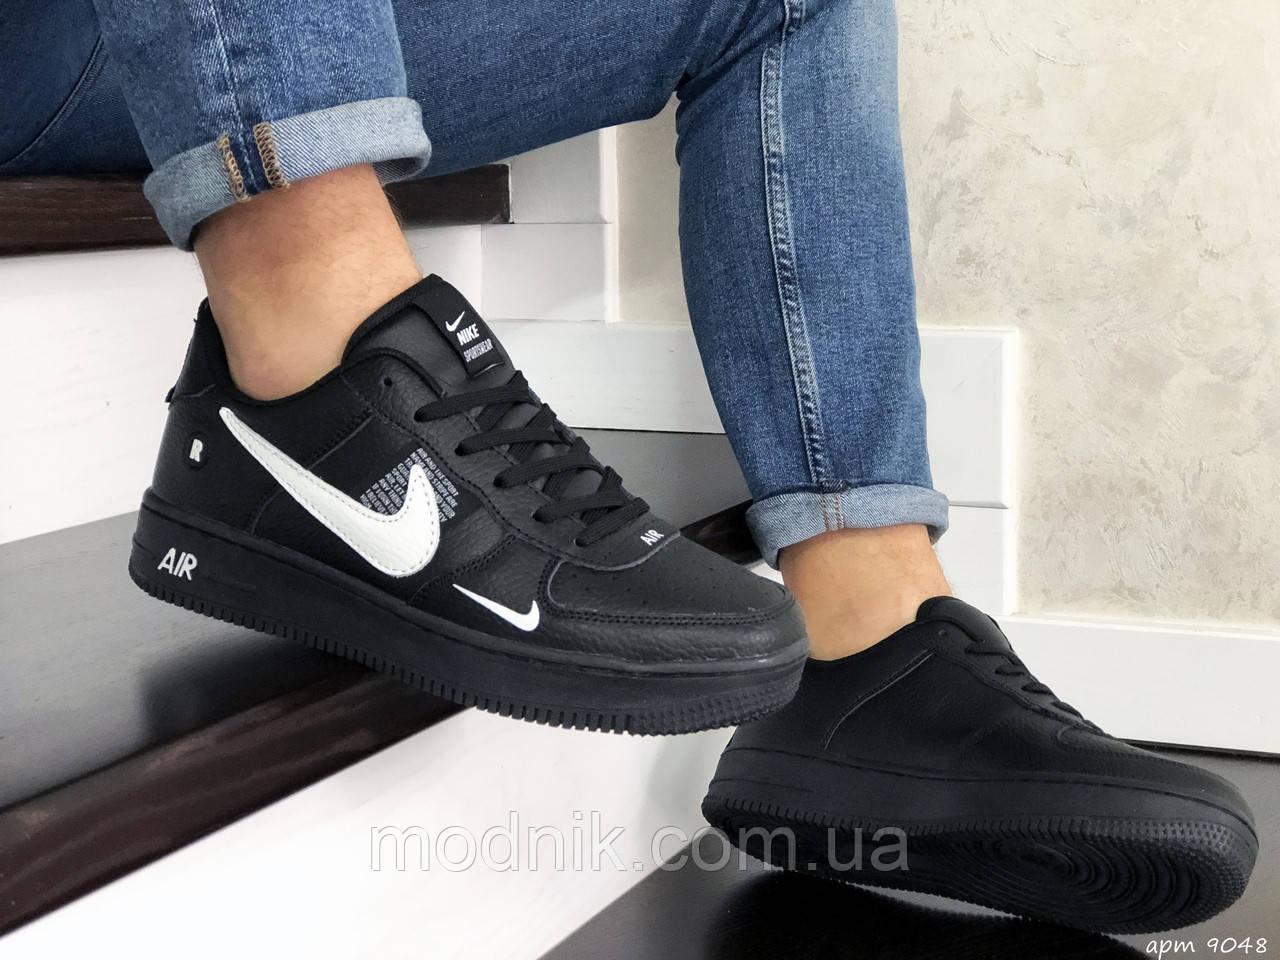 Мужские кроссовки Nike Air Force (черно-белые) 9048